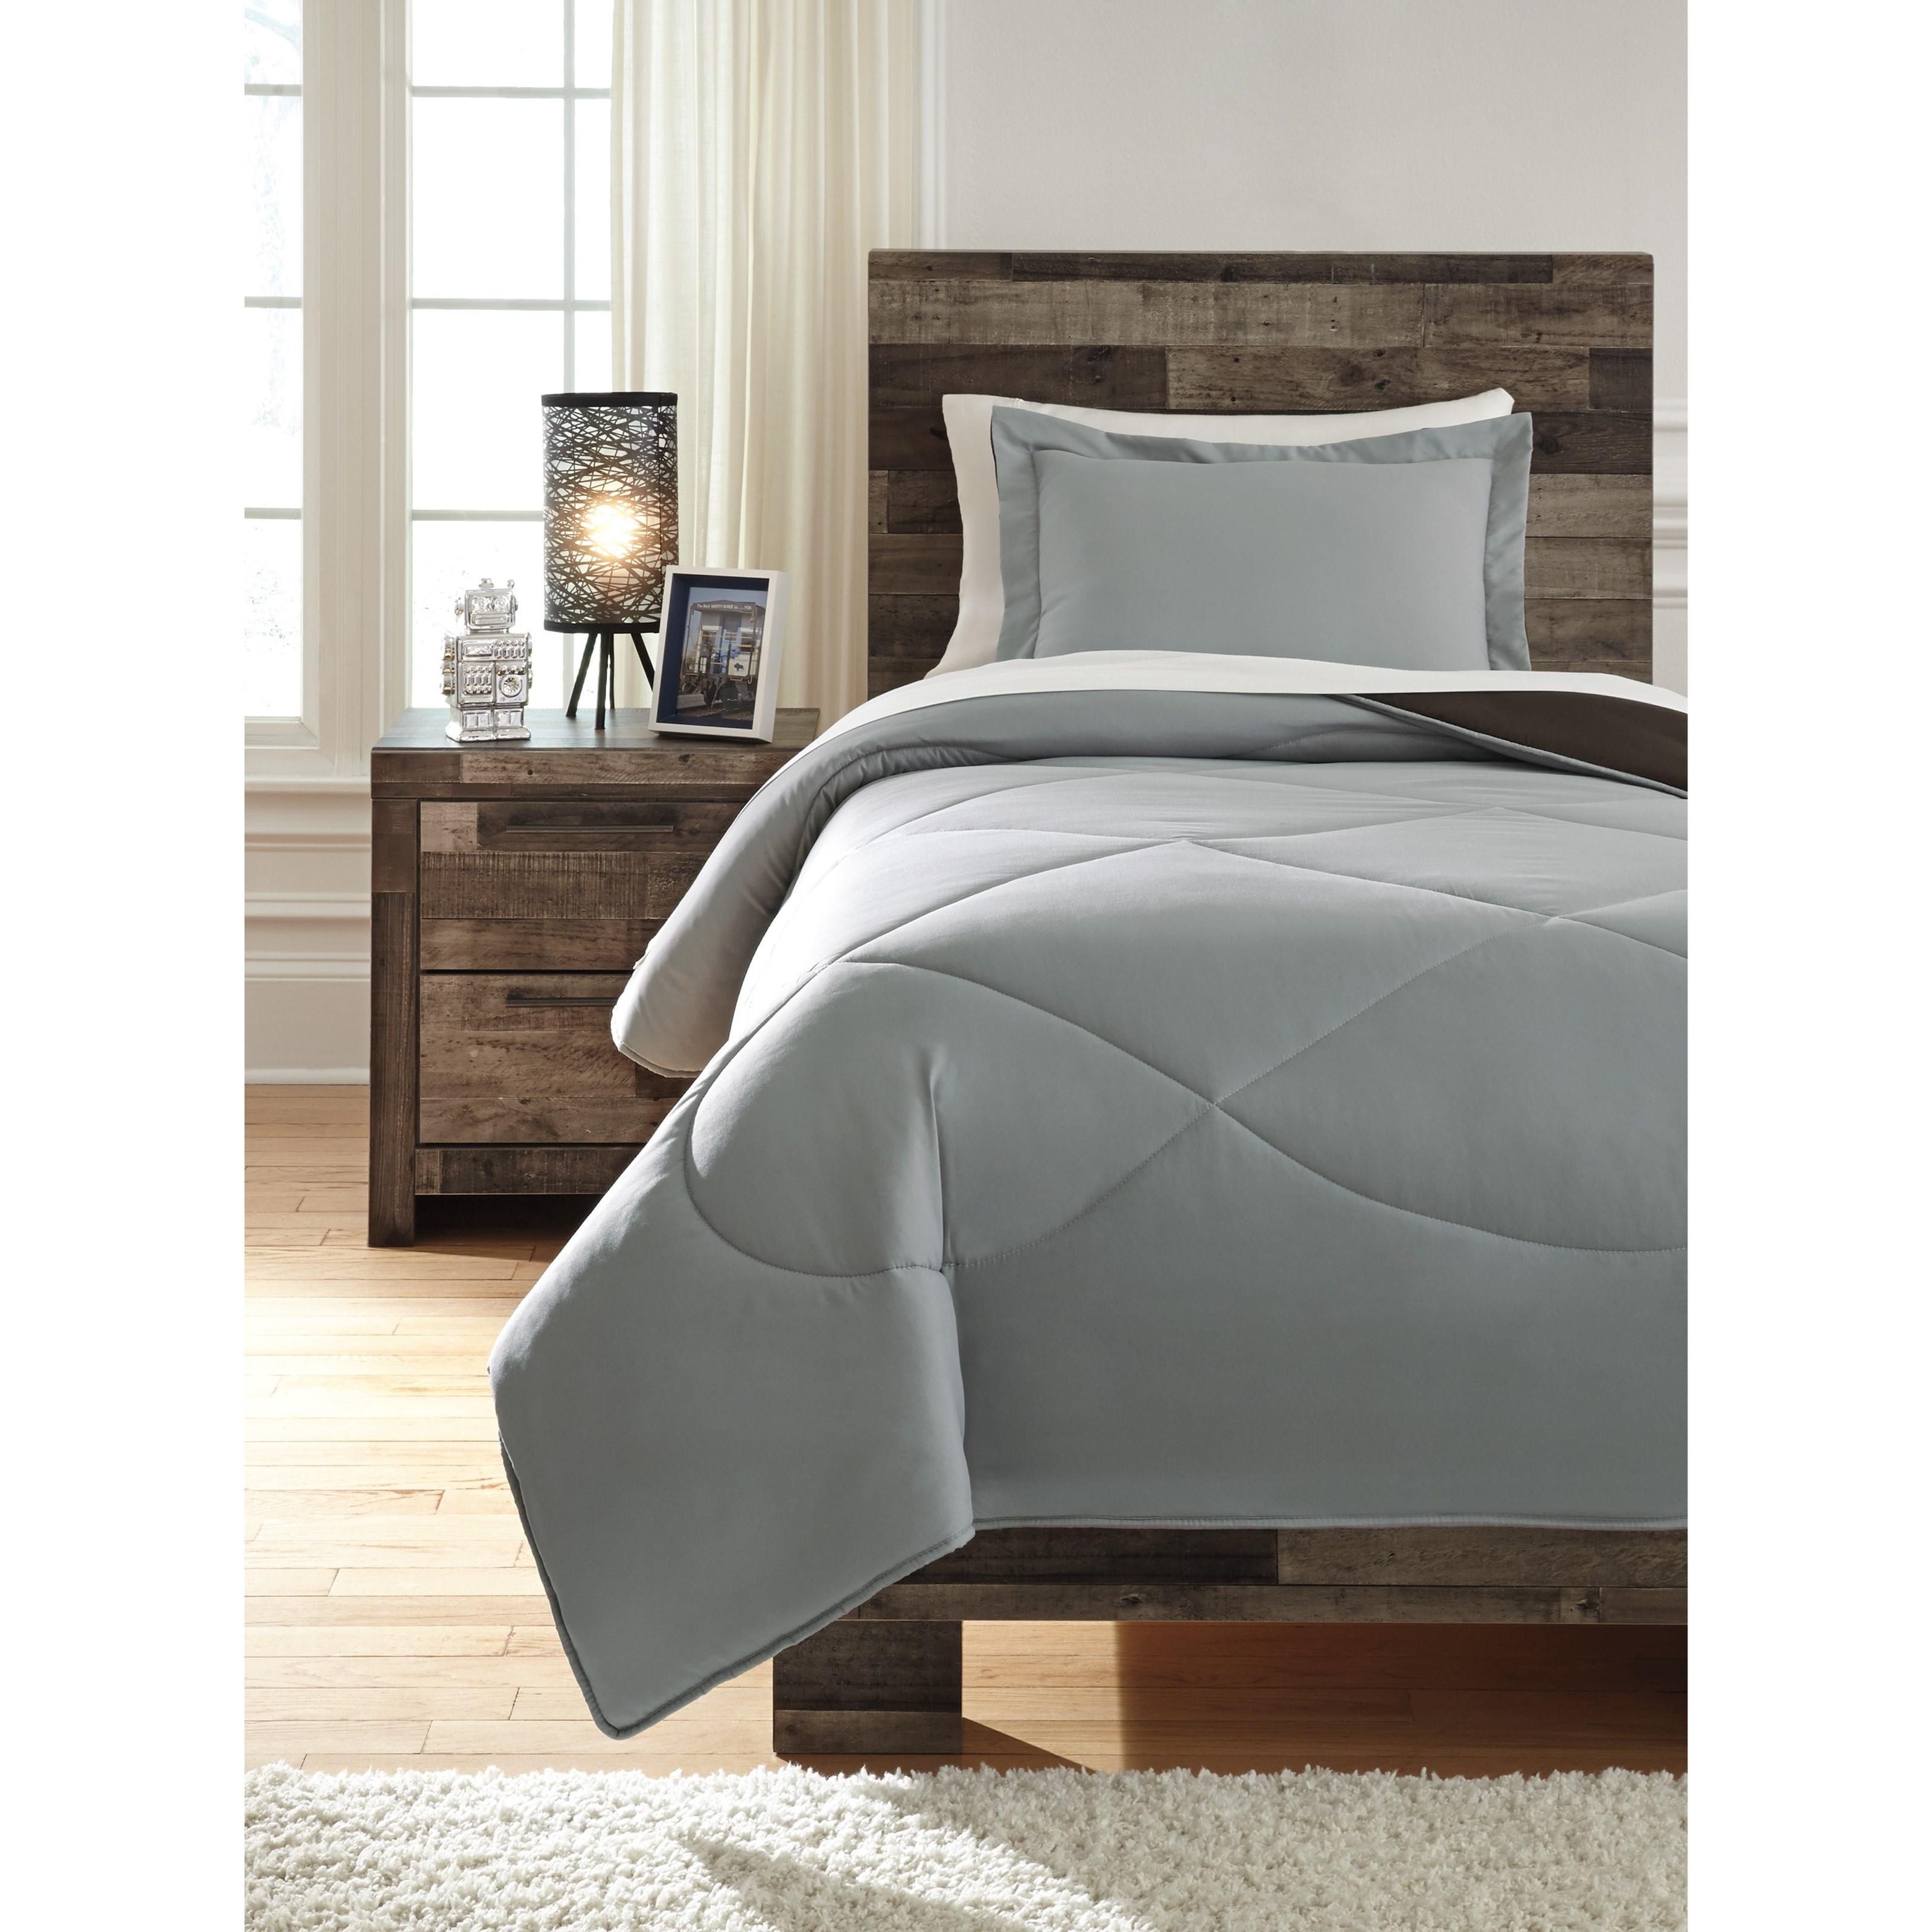 Twin Massey Gray/Black Comforter Set